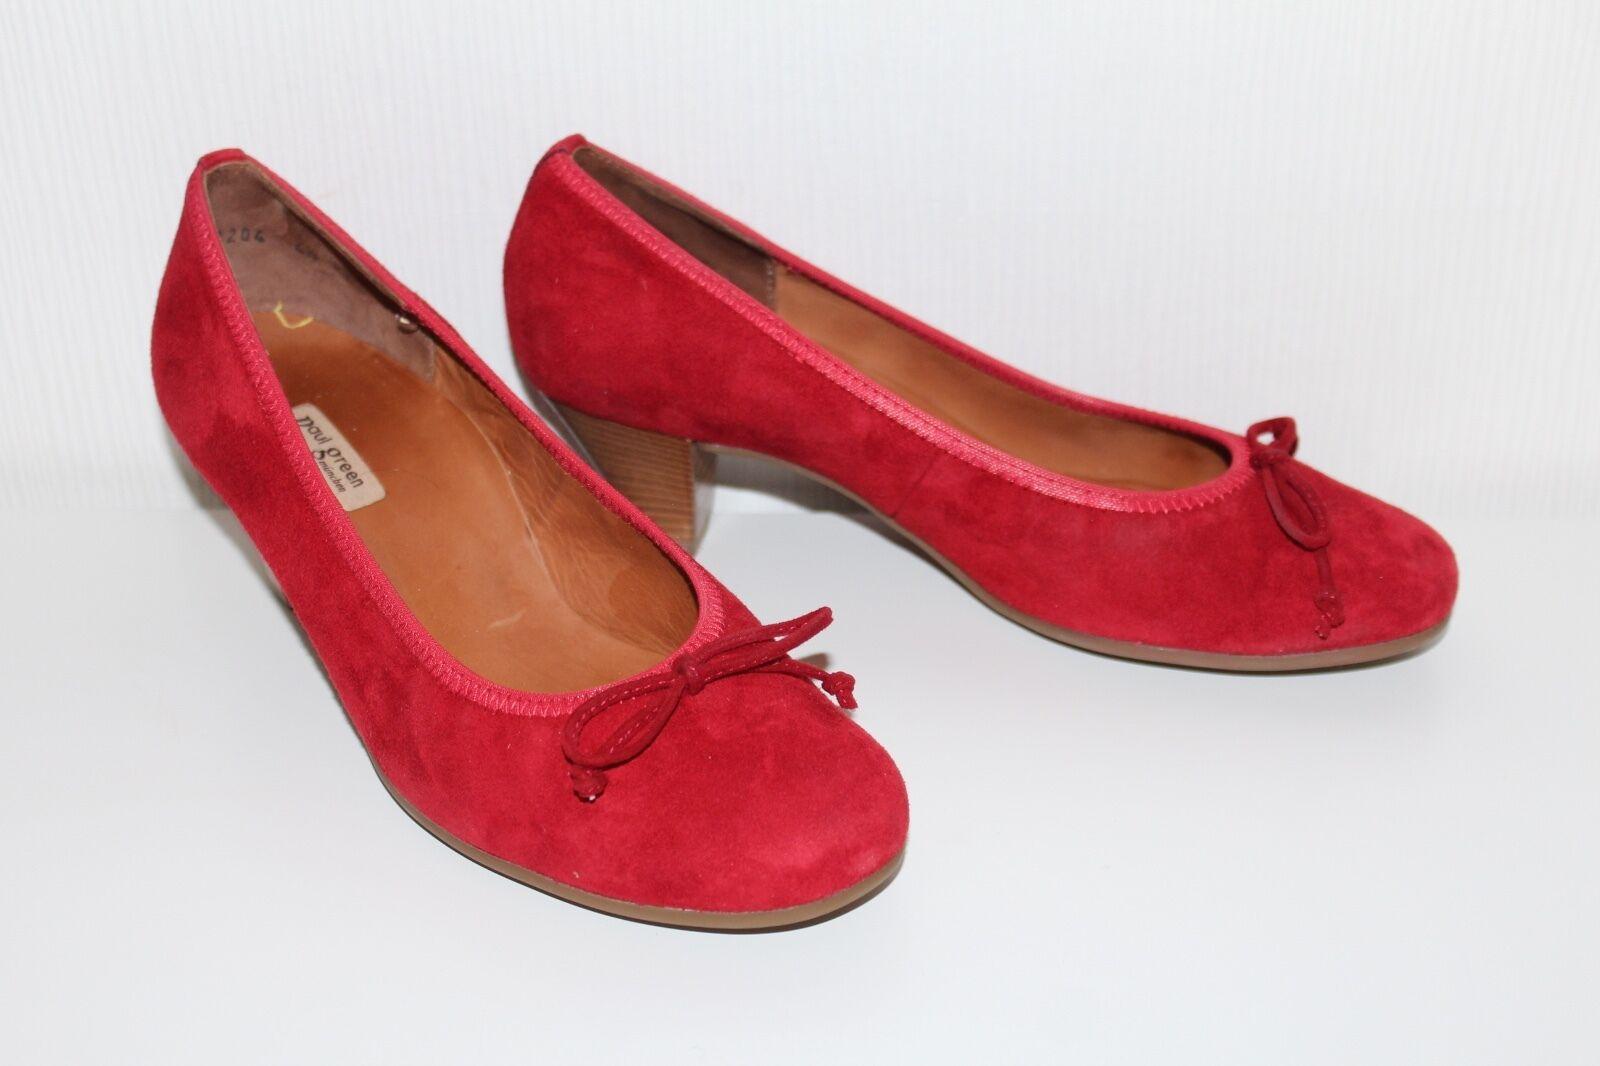 PAUL GREEN PG München Damen PUMPS Schuhe 37 UK4.5 Wildleder LEDER ROT HEELS